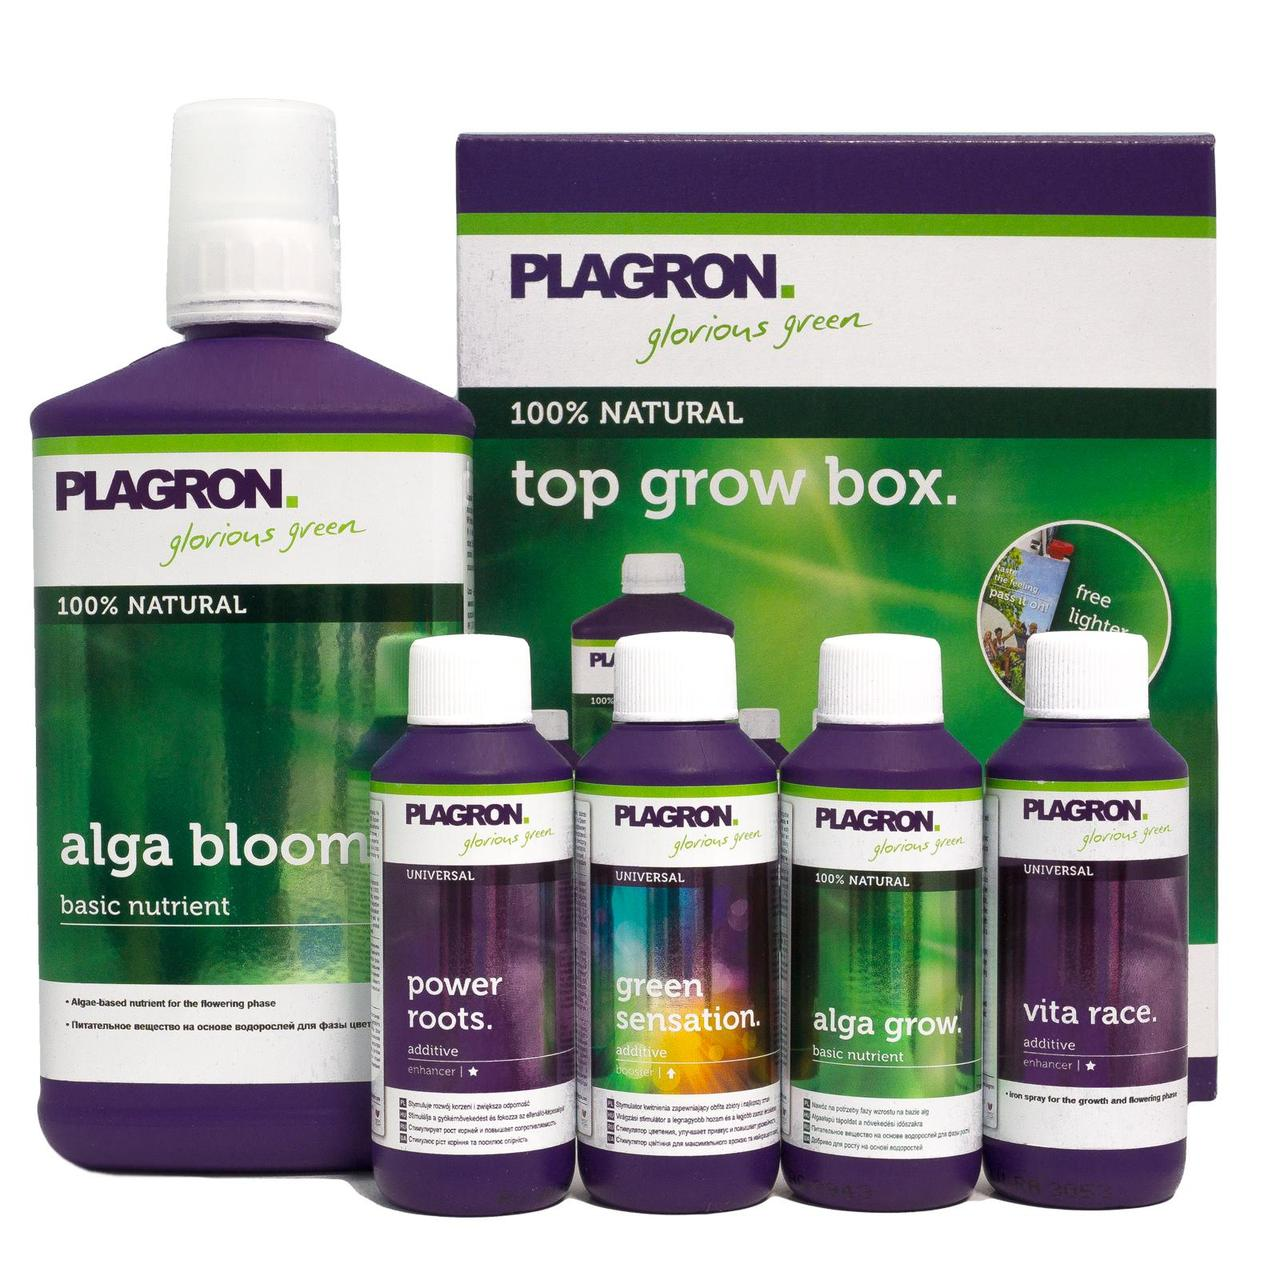 PLAGRON Top Grow Box 100% Bio. Комплект удобрений для гидропоники и биопоники. Оригинал. Нидерланды.